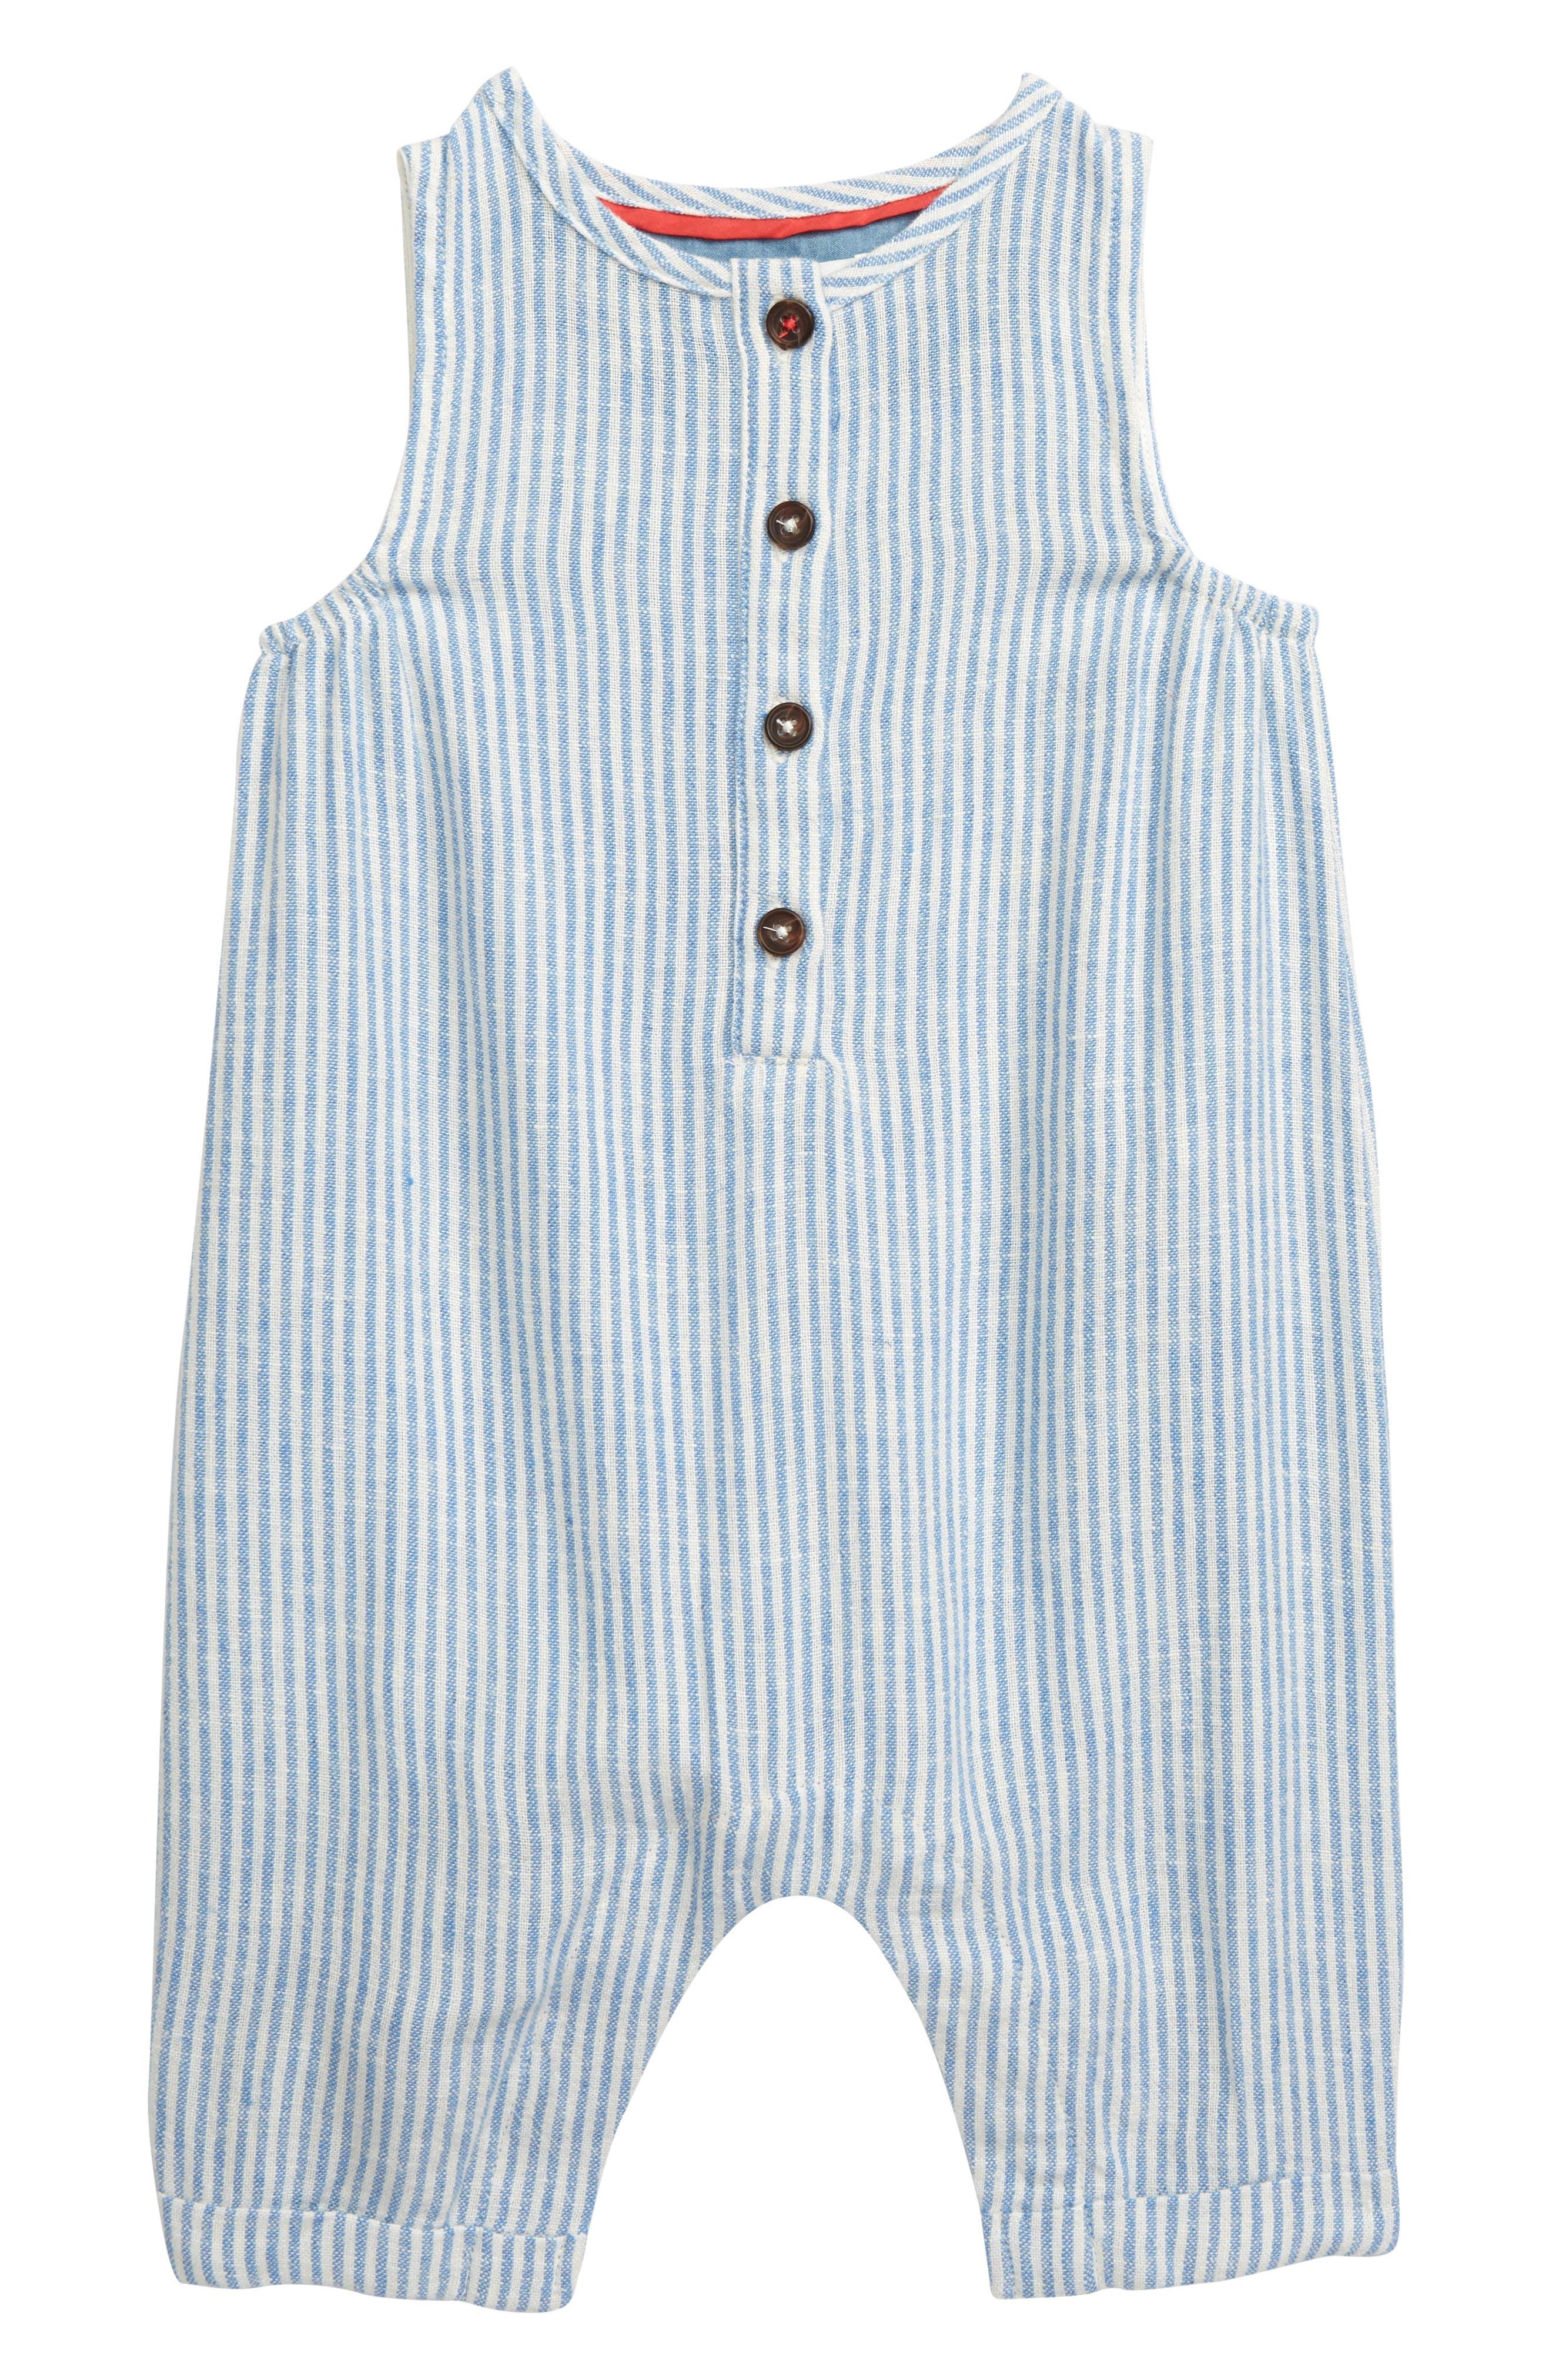 Girls' Clothing (newborn-5t) Excellent Condition Baby Girl Gap 0-3 Months Soft Knit One-piece Romper